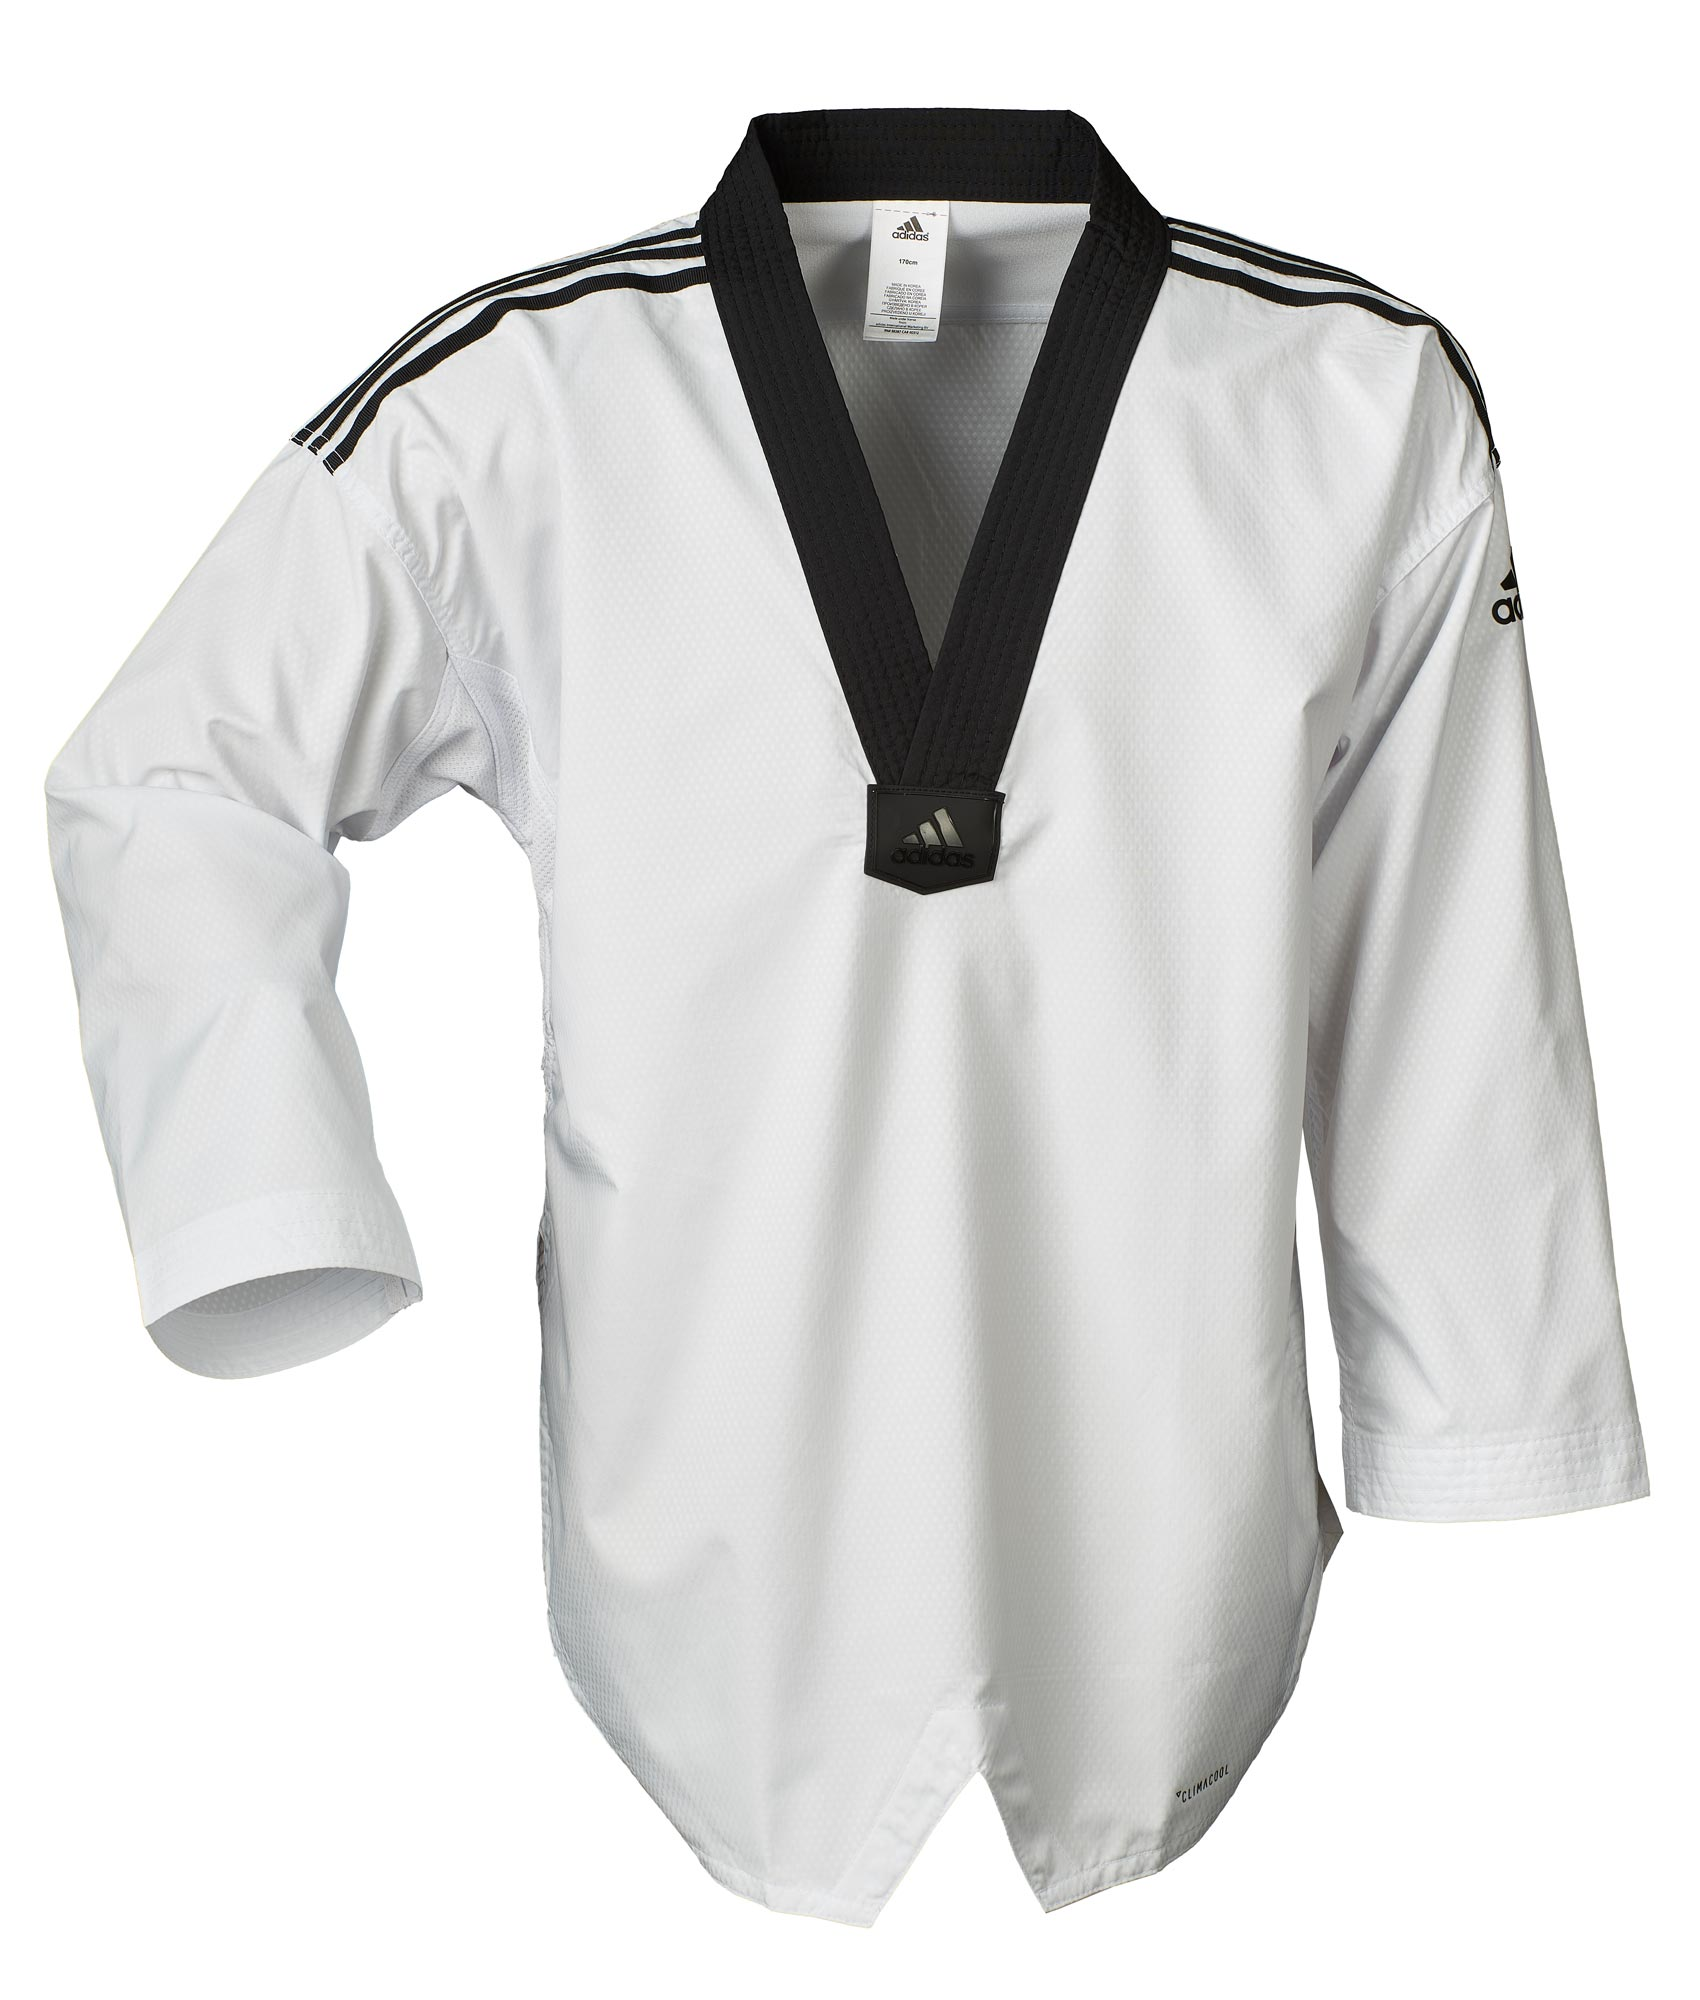 Adidas Taekwondo Anzug adidas Fighter